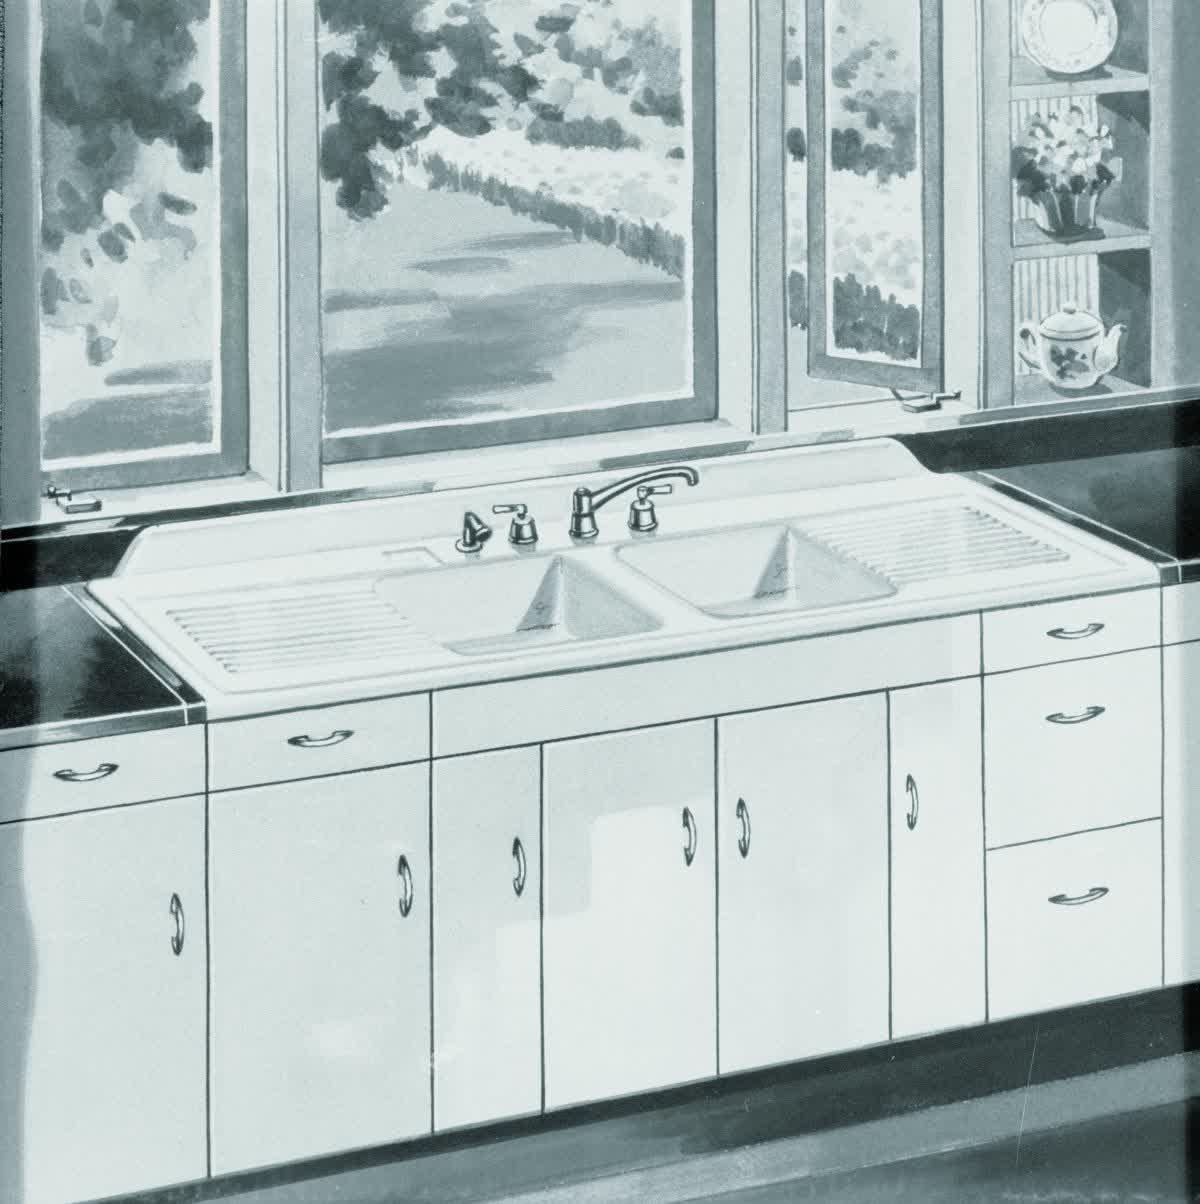 installing antique iron kitchen sink with drainboard - home design